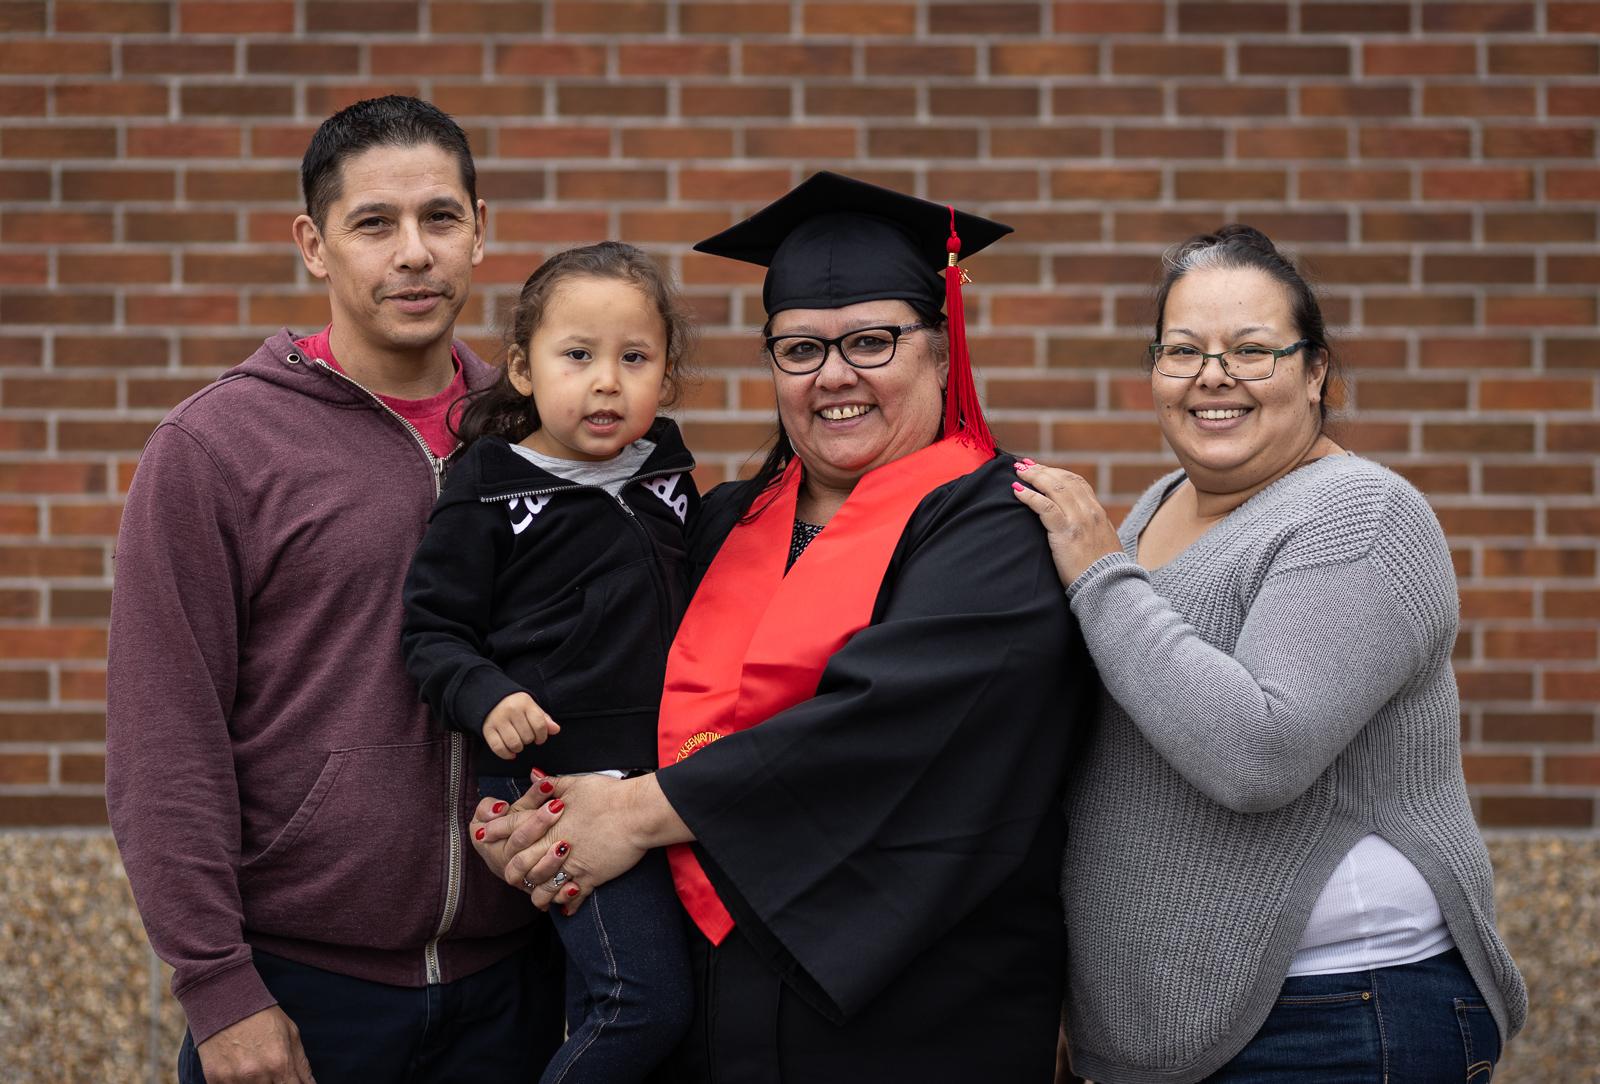 kihs-graduation-2019-fb-1.jpg